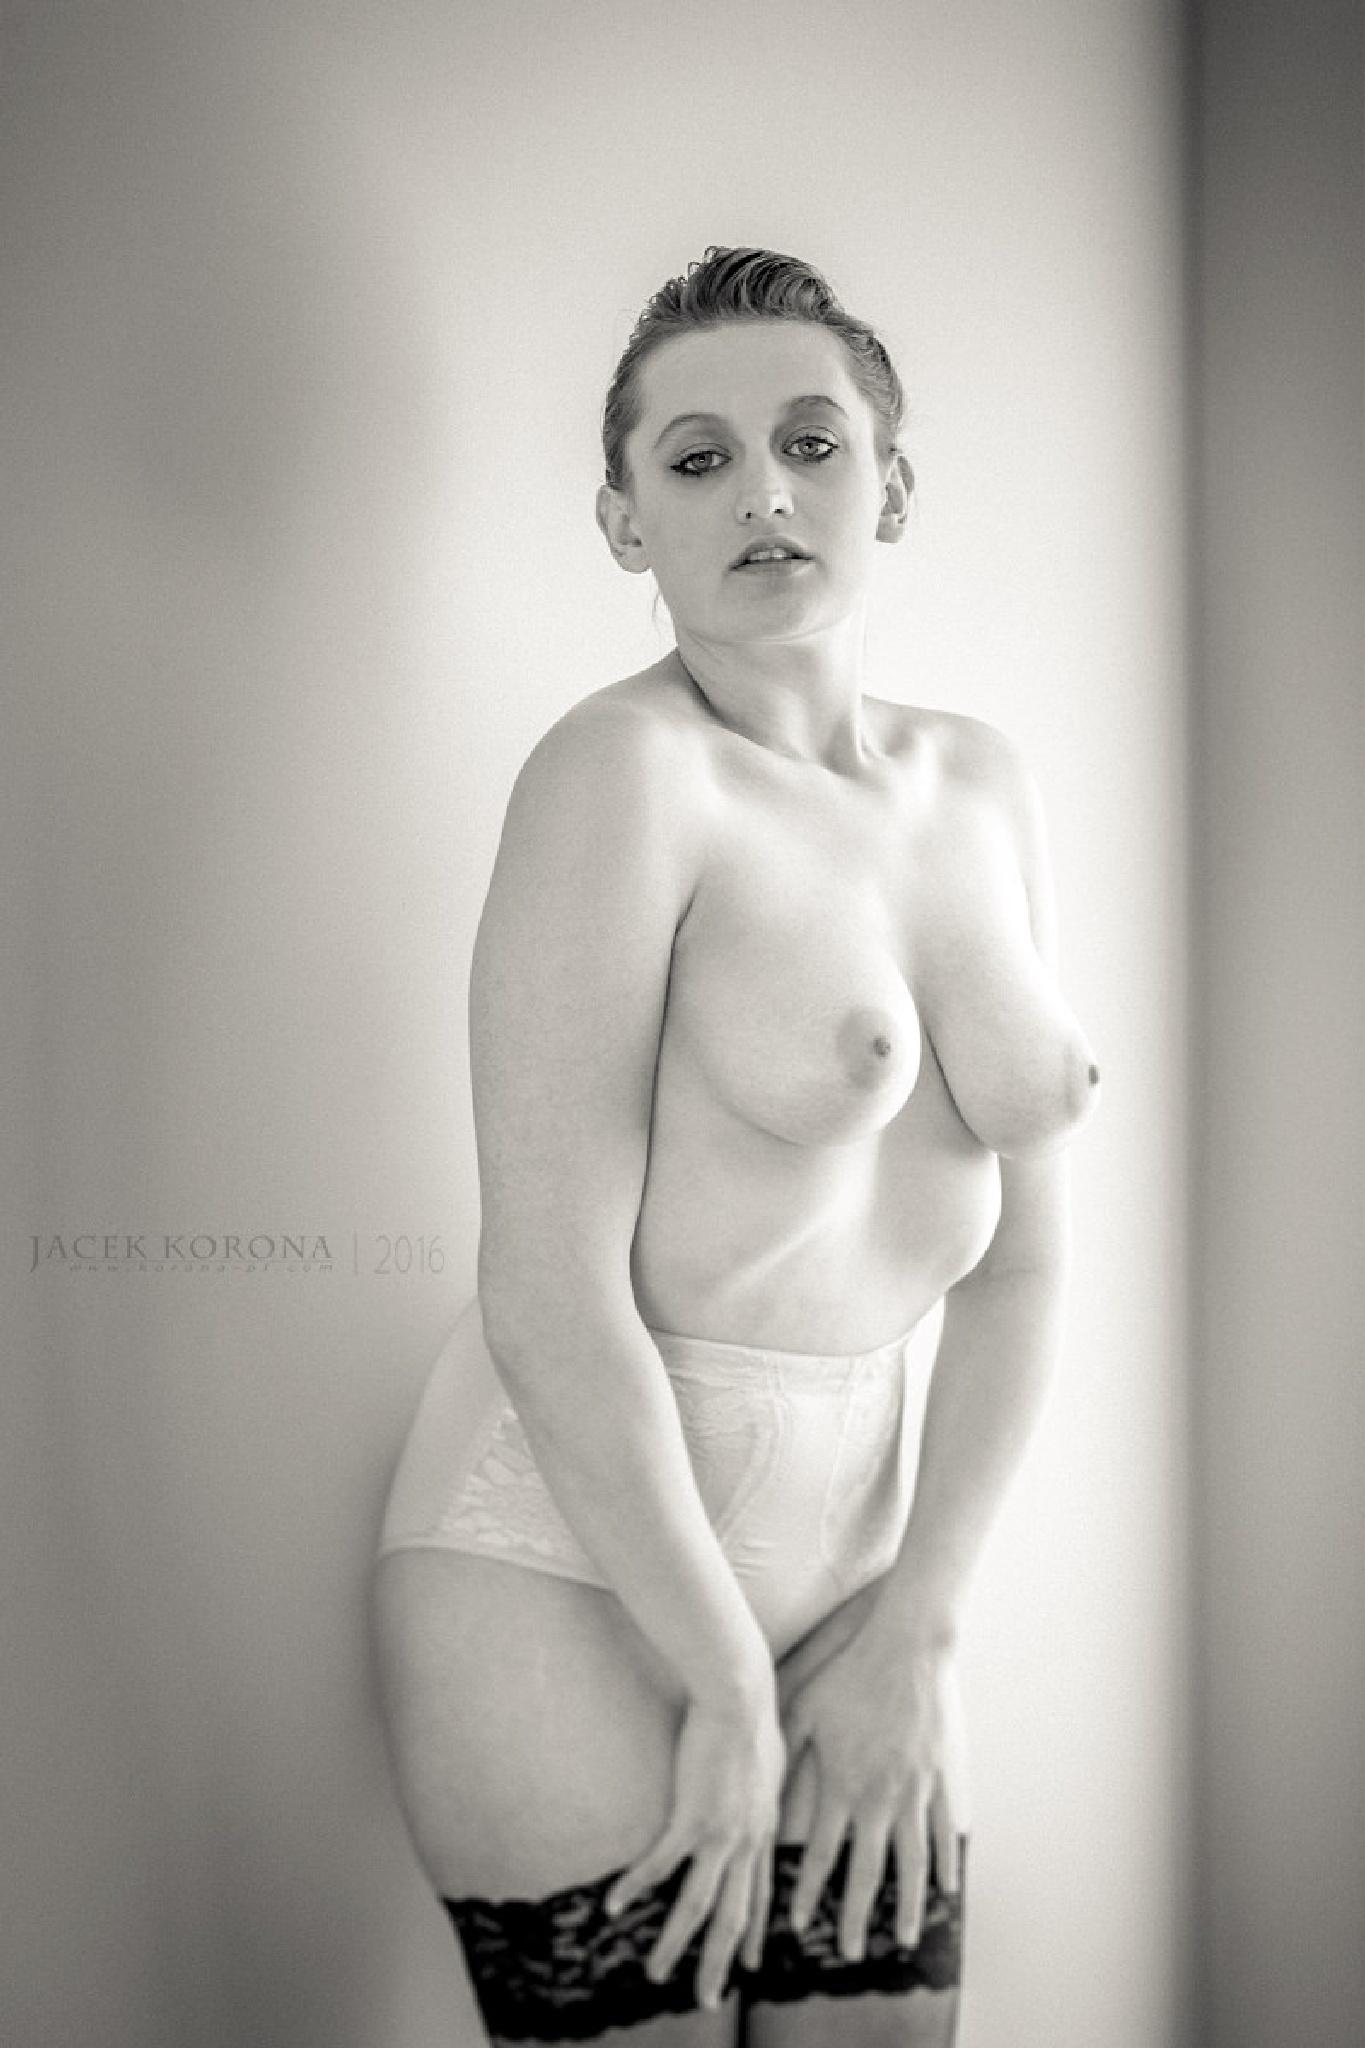 Natalia by Jacek Korona